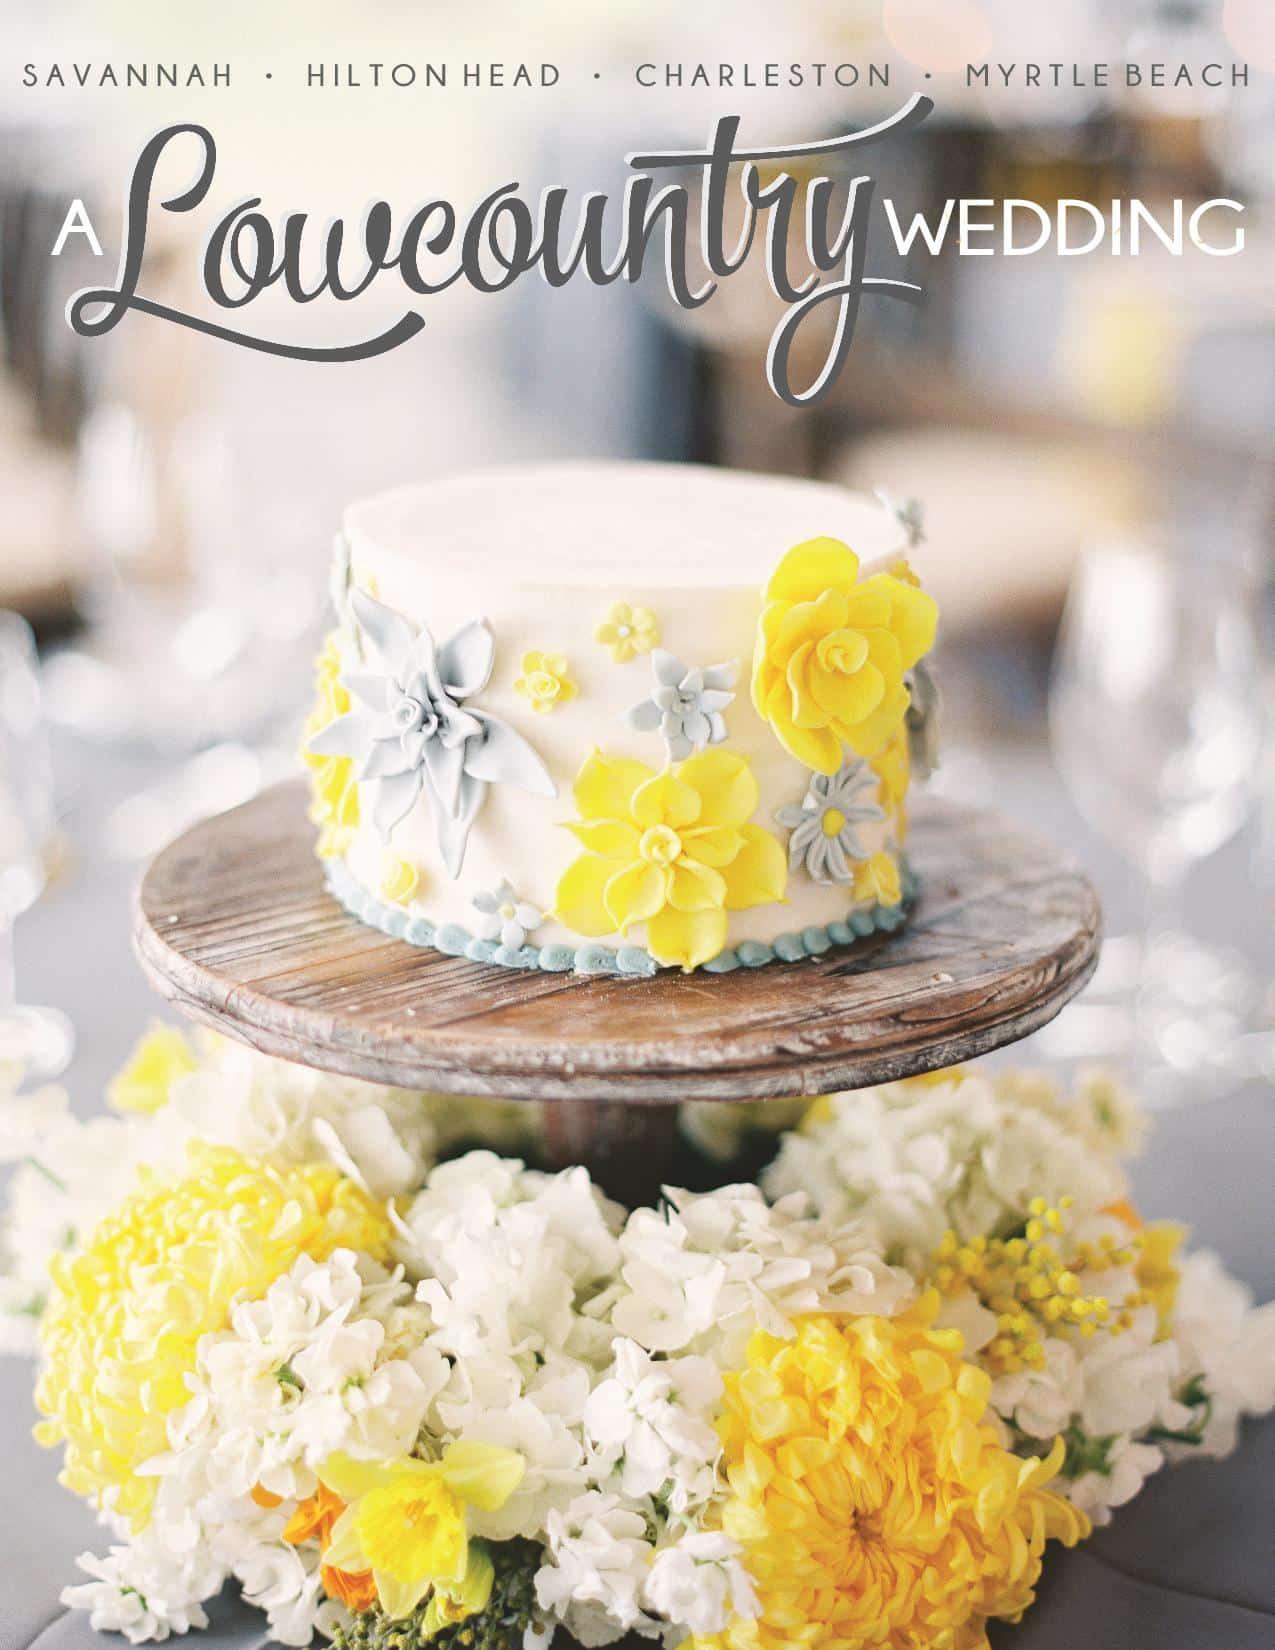 A Lowcountry Wedding: Callie & Gary/Janice & Mark - Patrick ...